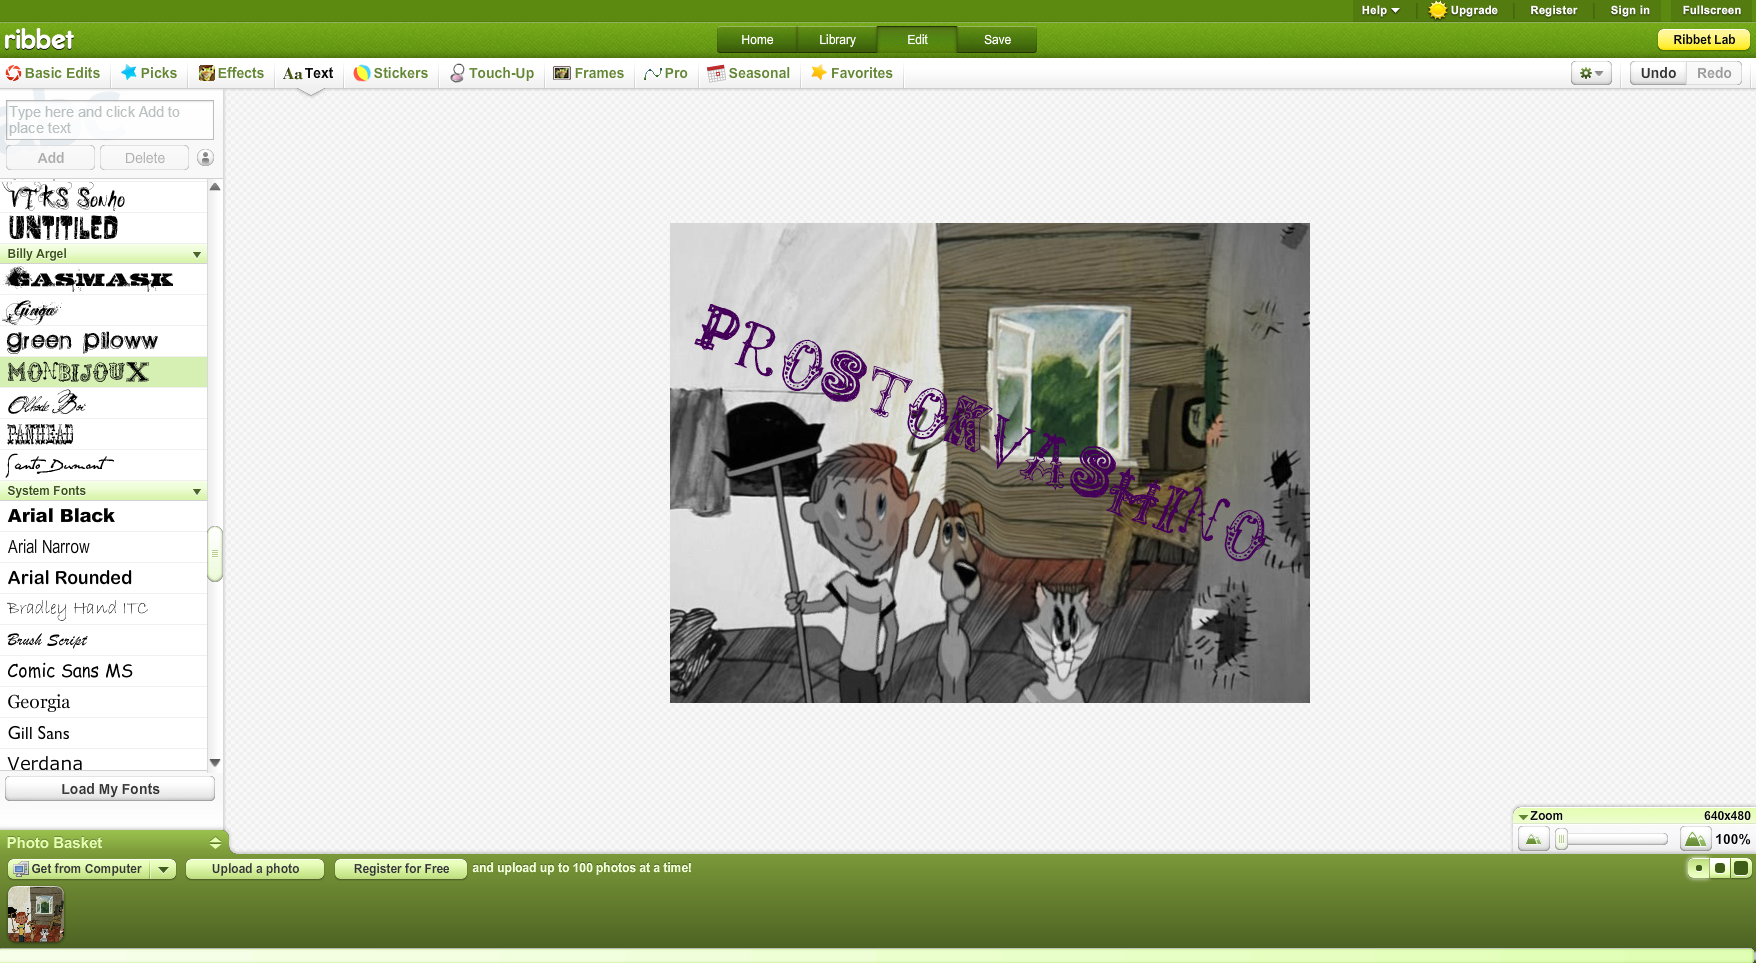 онлайн редактор фото со стикерами